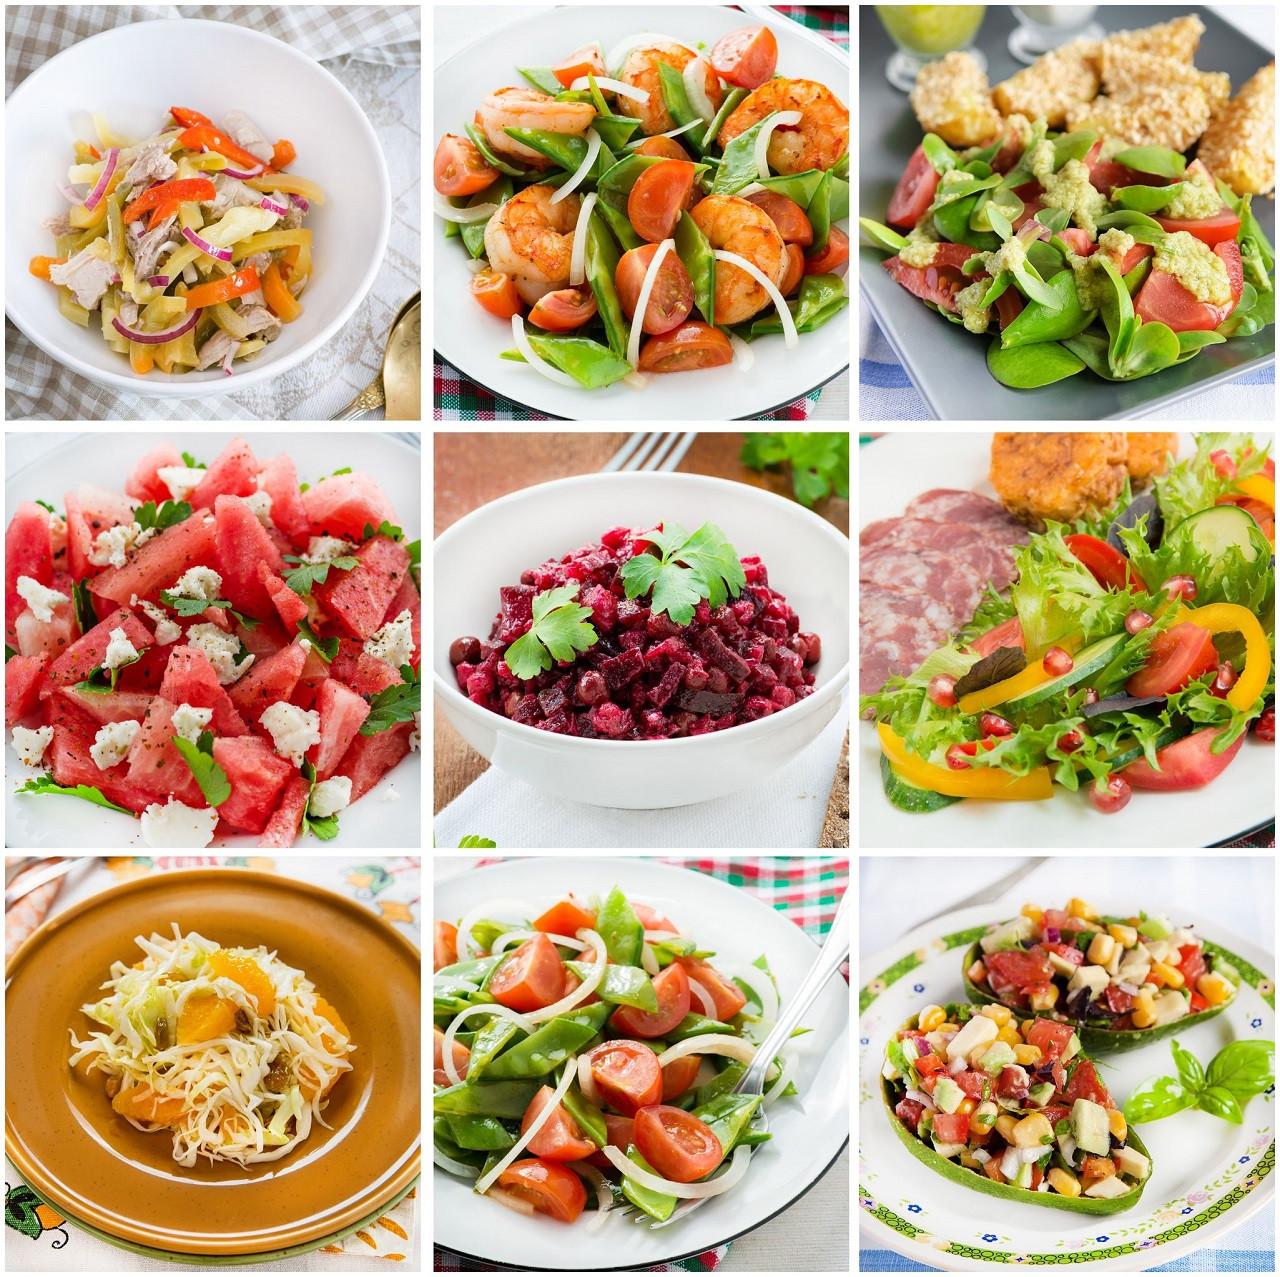 Salads For Dinner  WatchFit 5 Crunchy Healthy Salads For Dinner